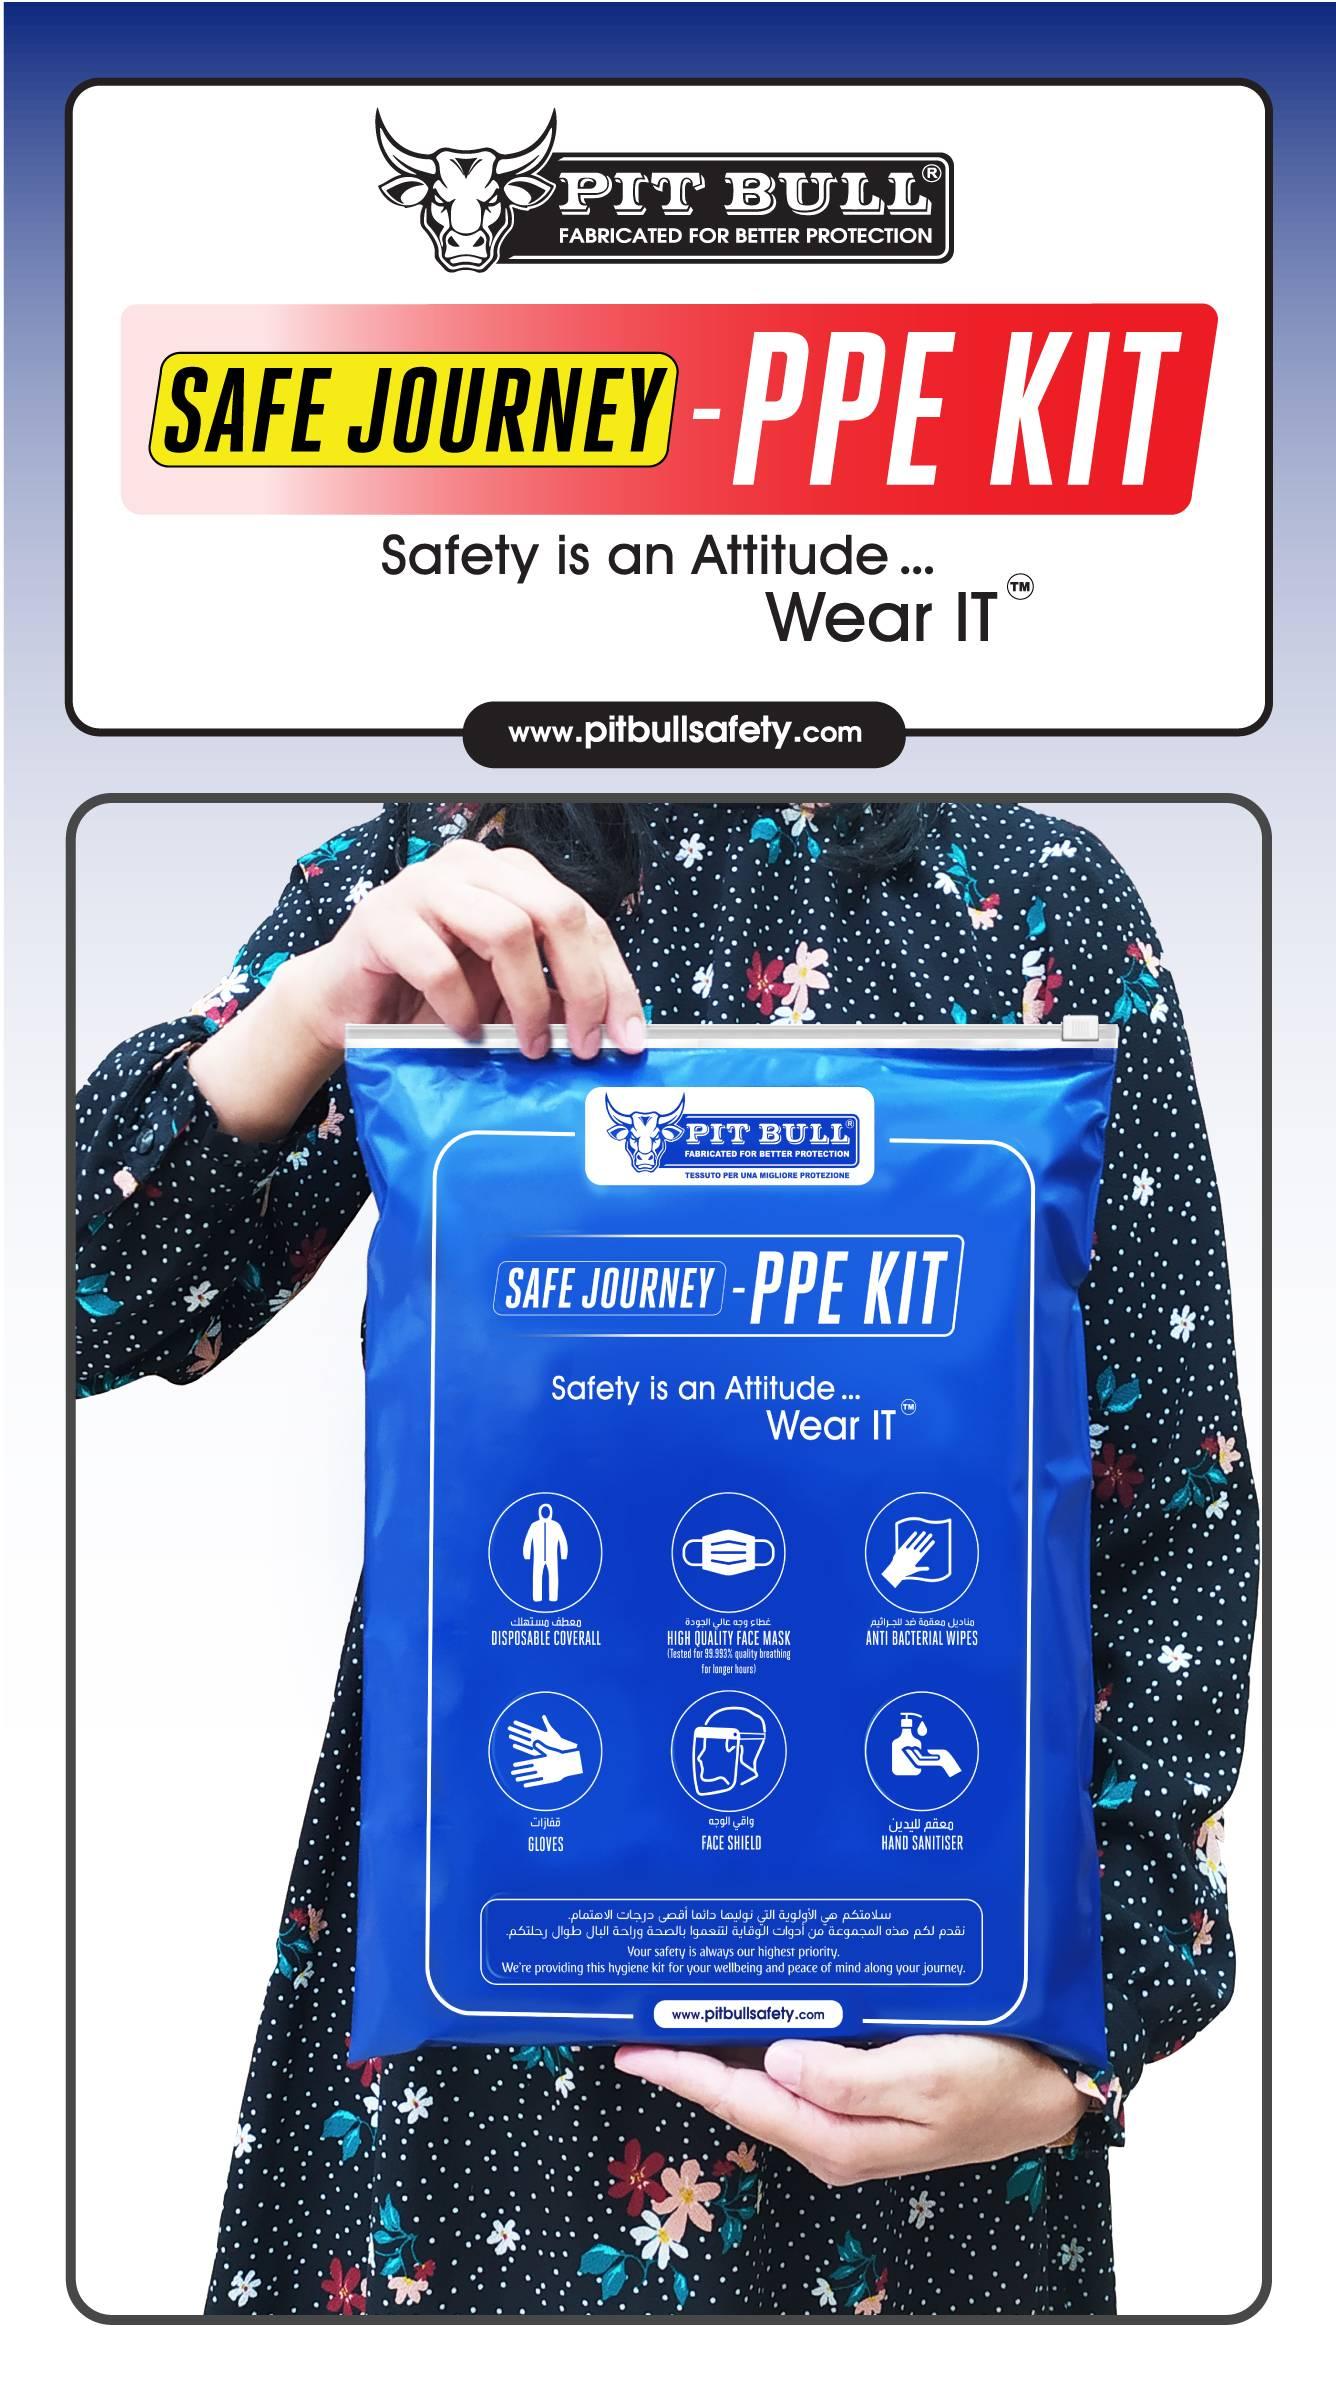 Safe Journey PPE Kit